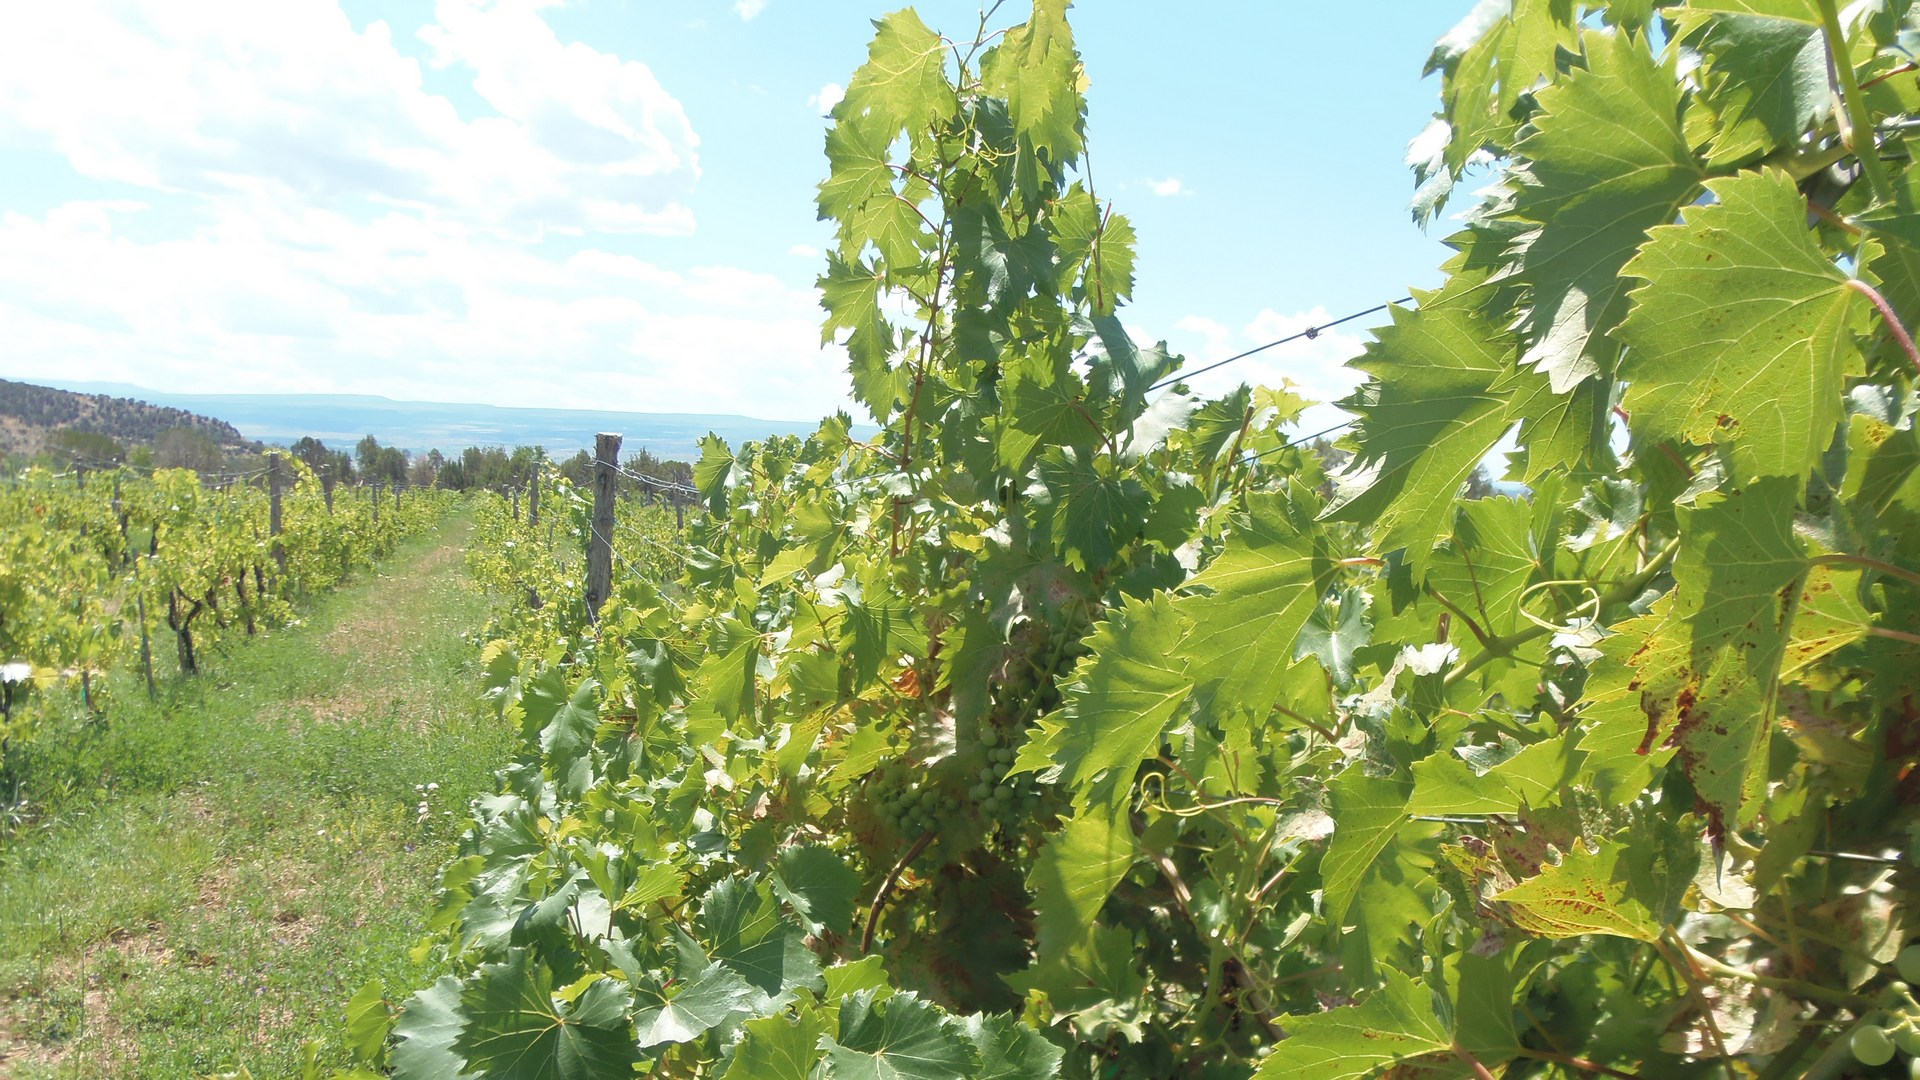 Leroux-Creek-VineyardsCO-1980w-1080h